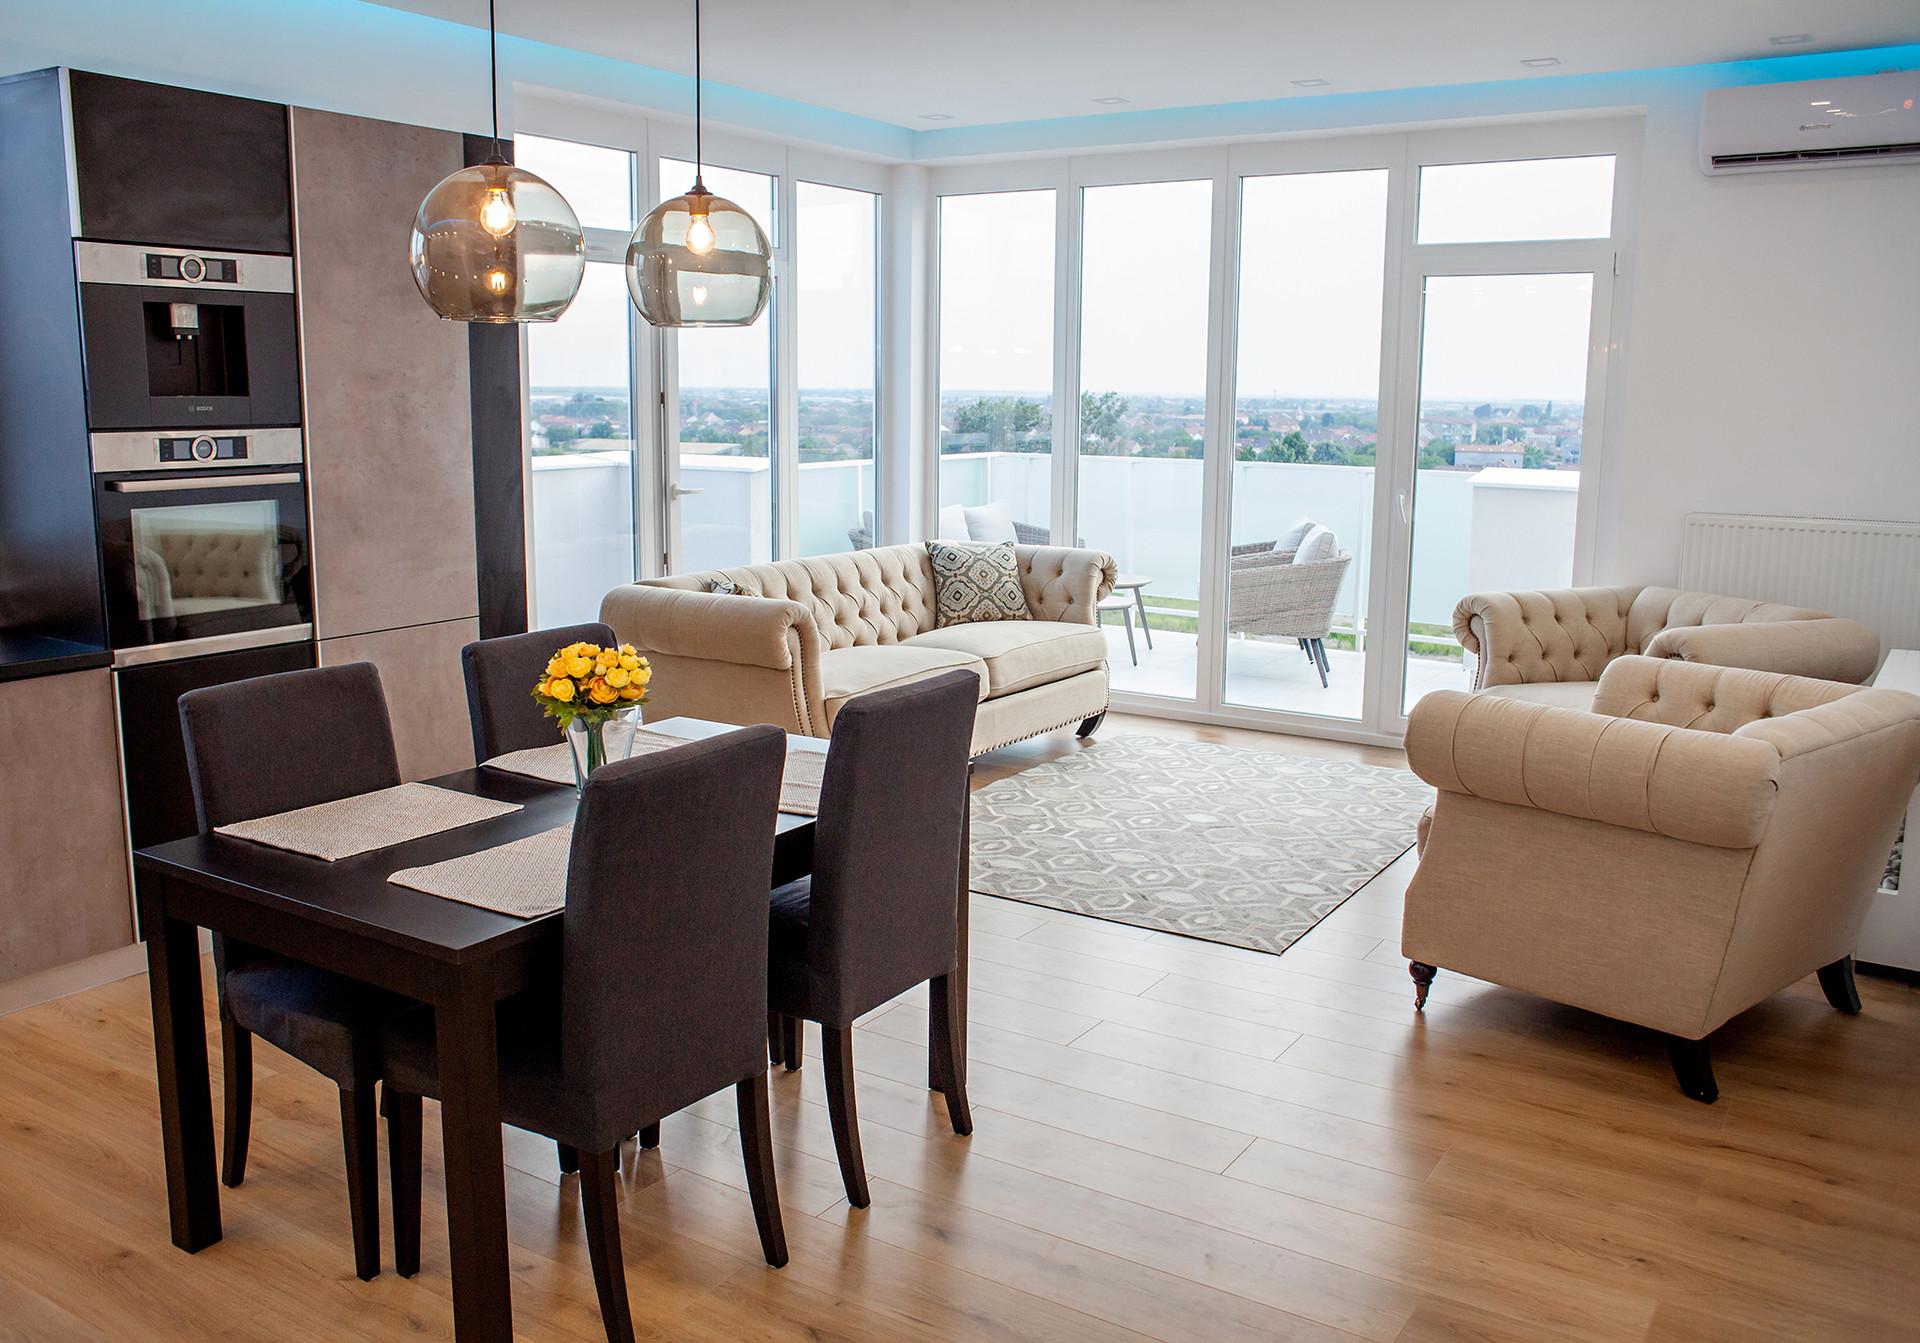 penthouse-apartment-a96c74aeb5b362d2c27bf5a790c0aca8